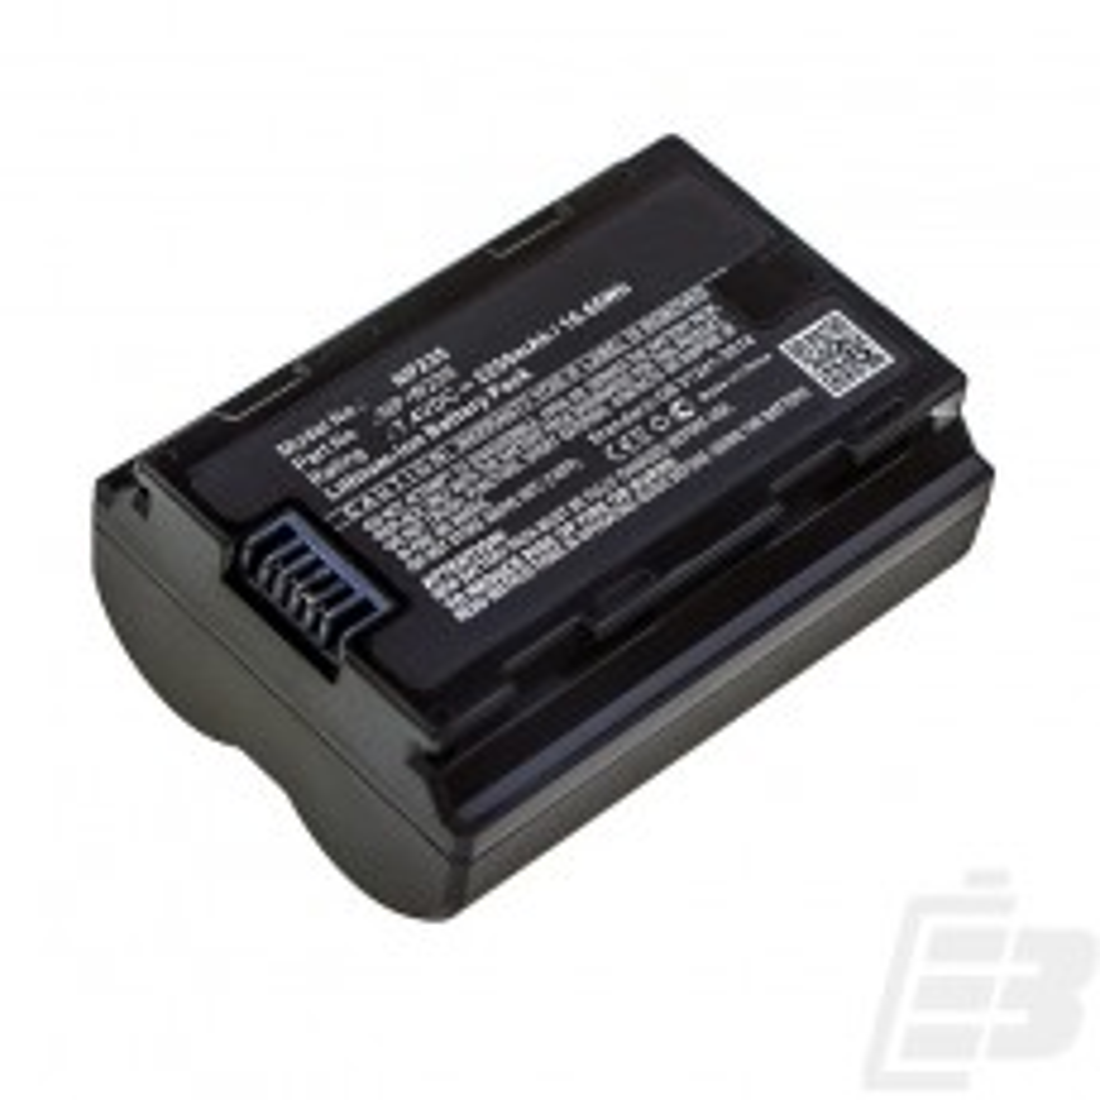 Camera battery Fujifilm NP-W235_1